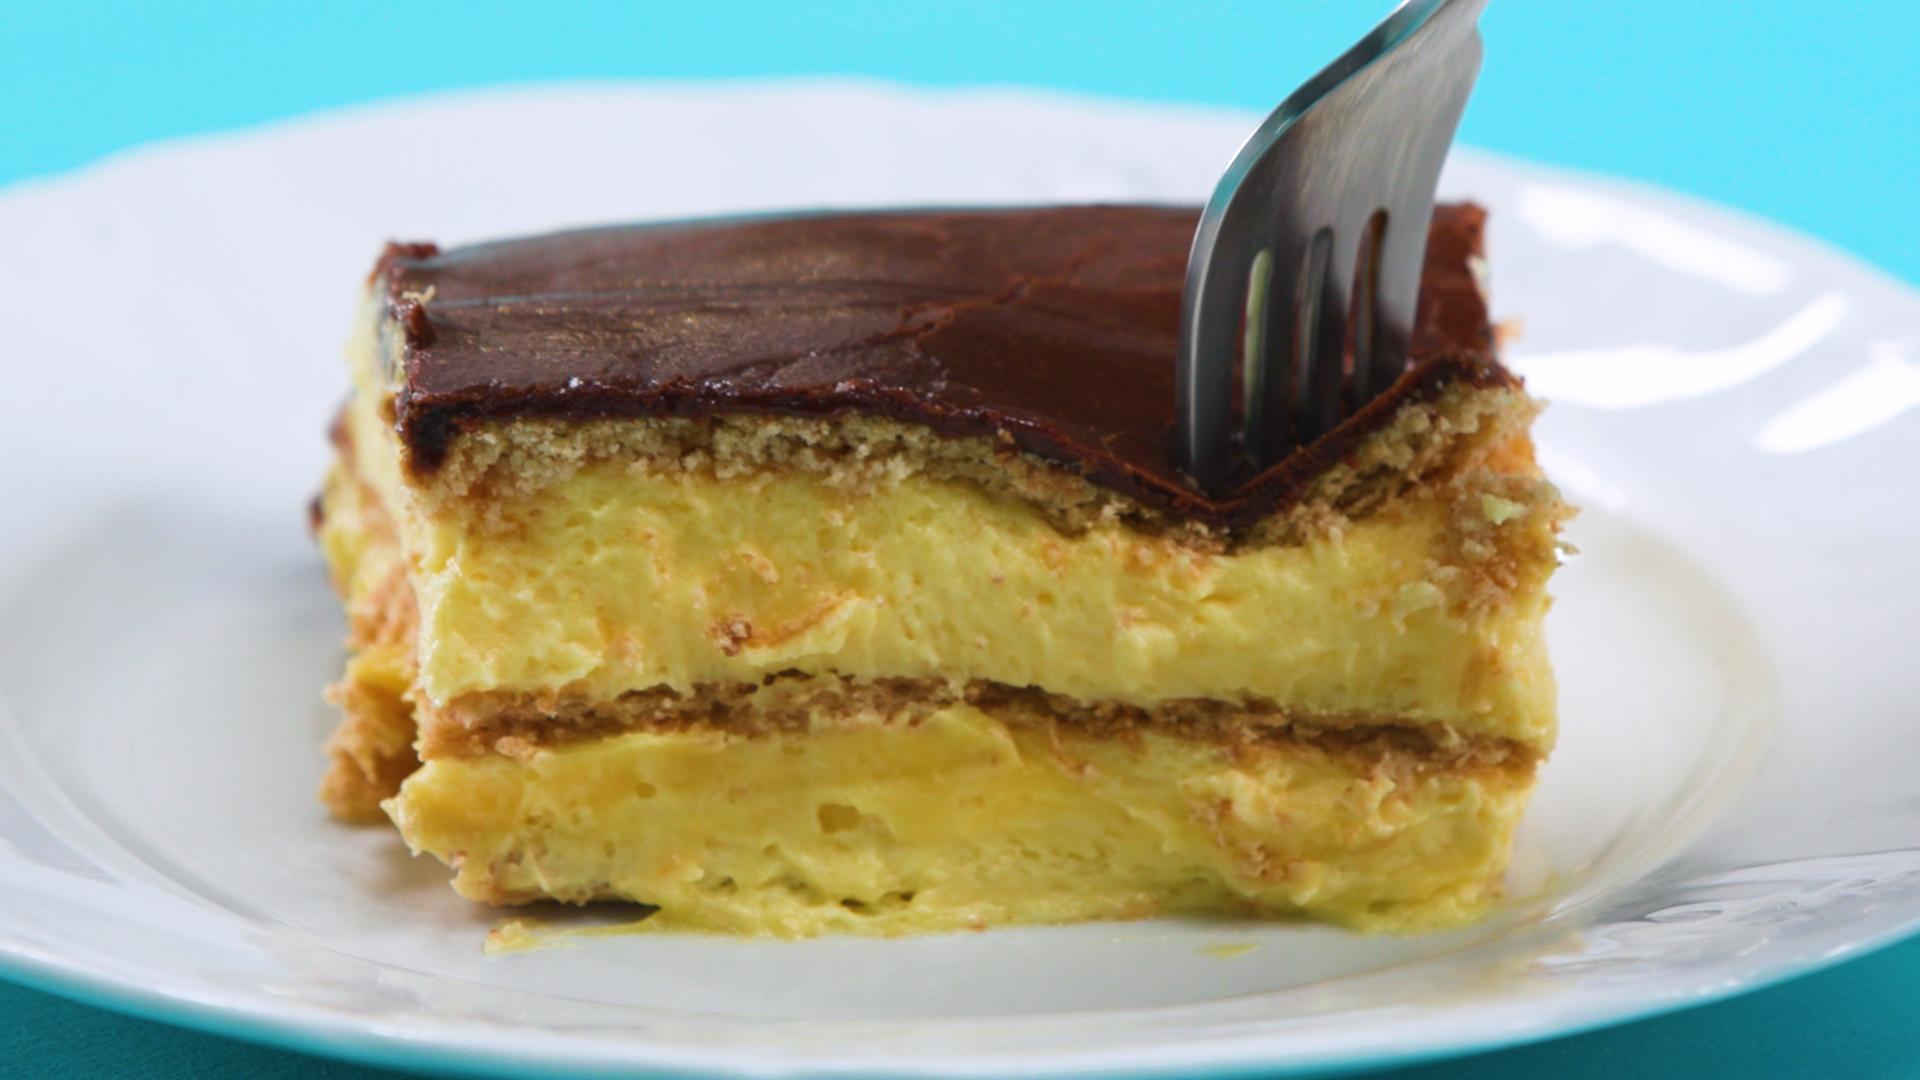 How to Make No Bake Chocolate Eclair Cake